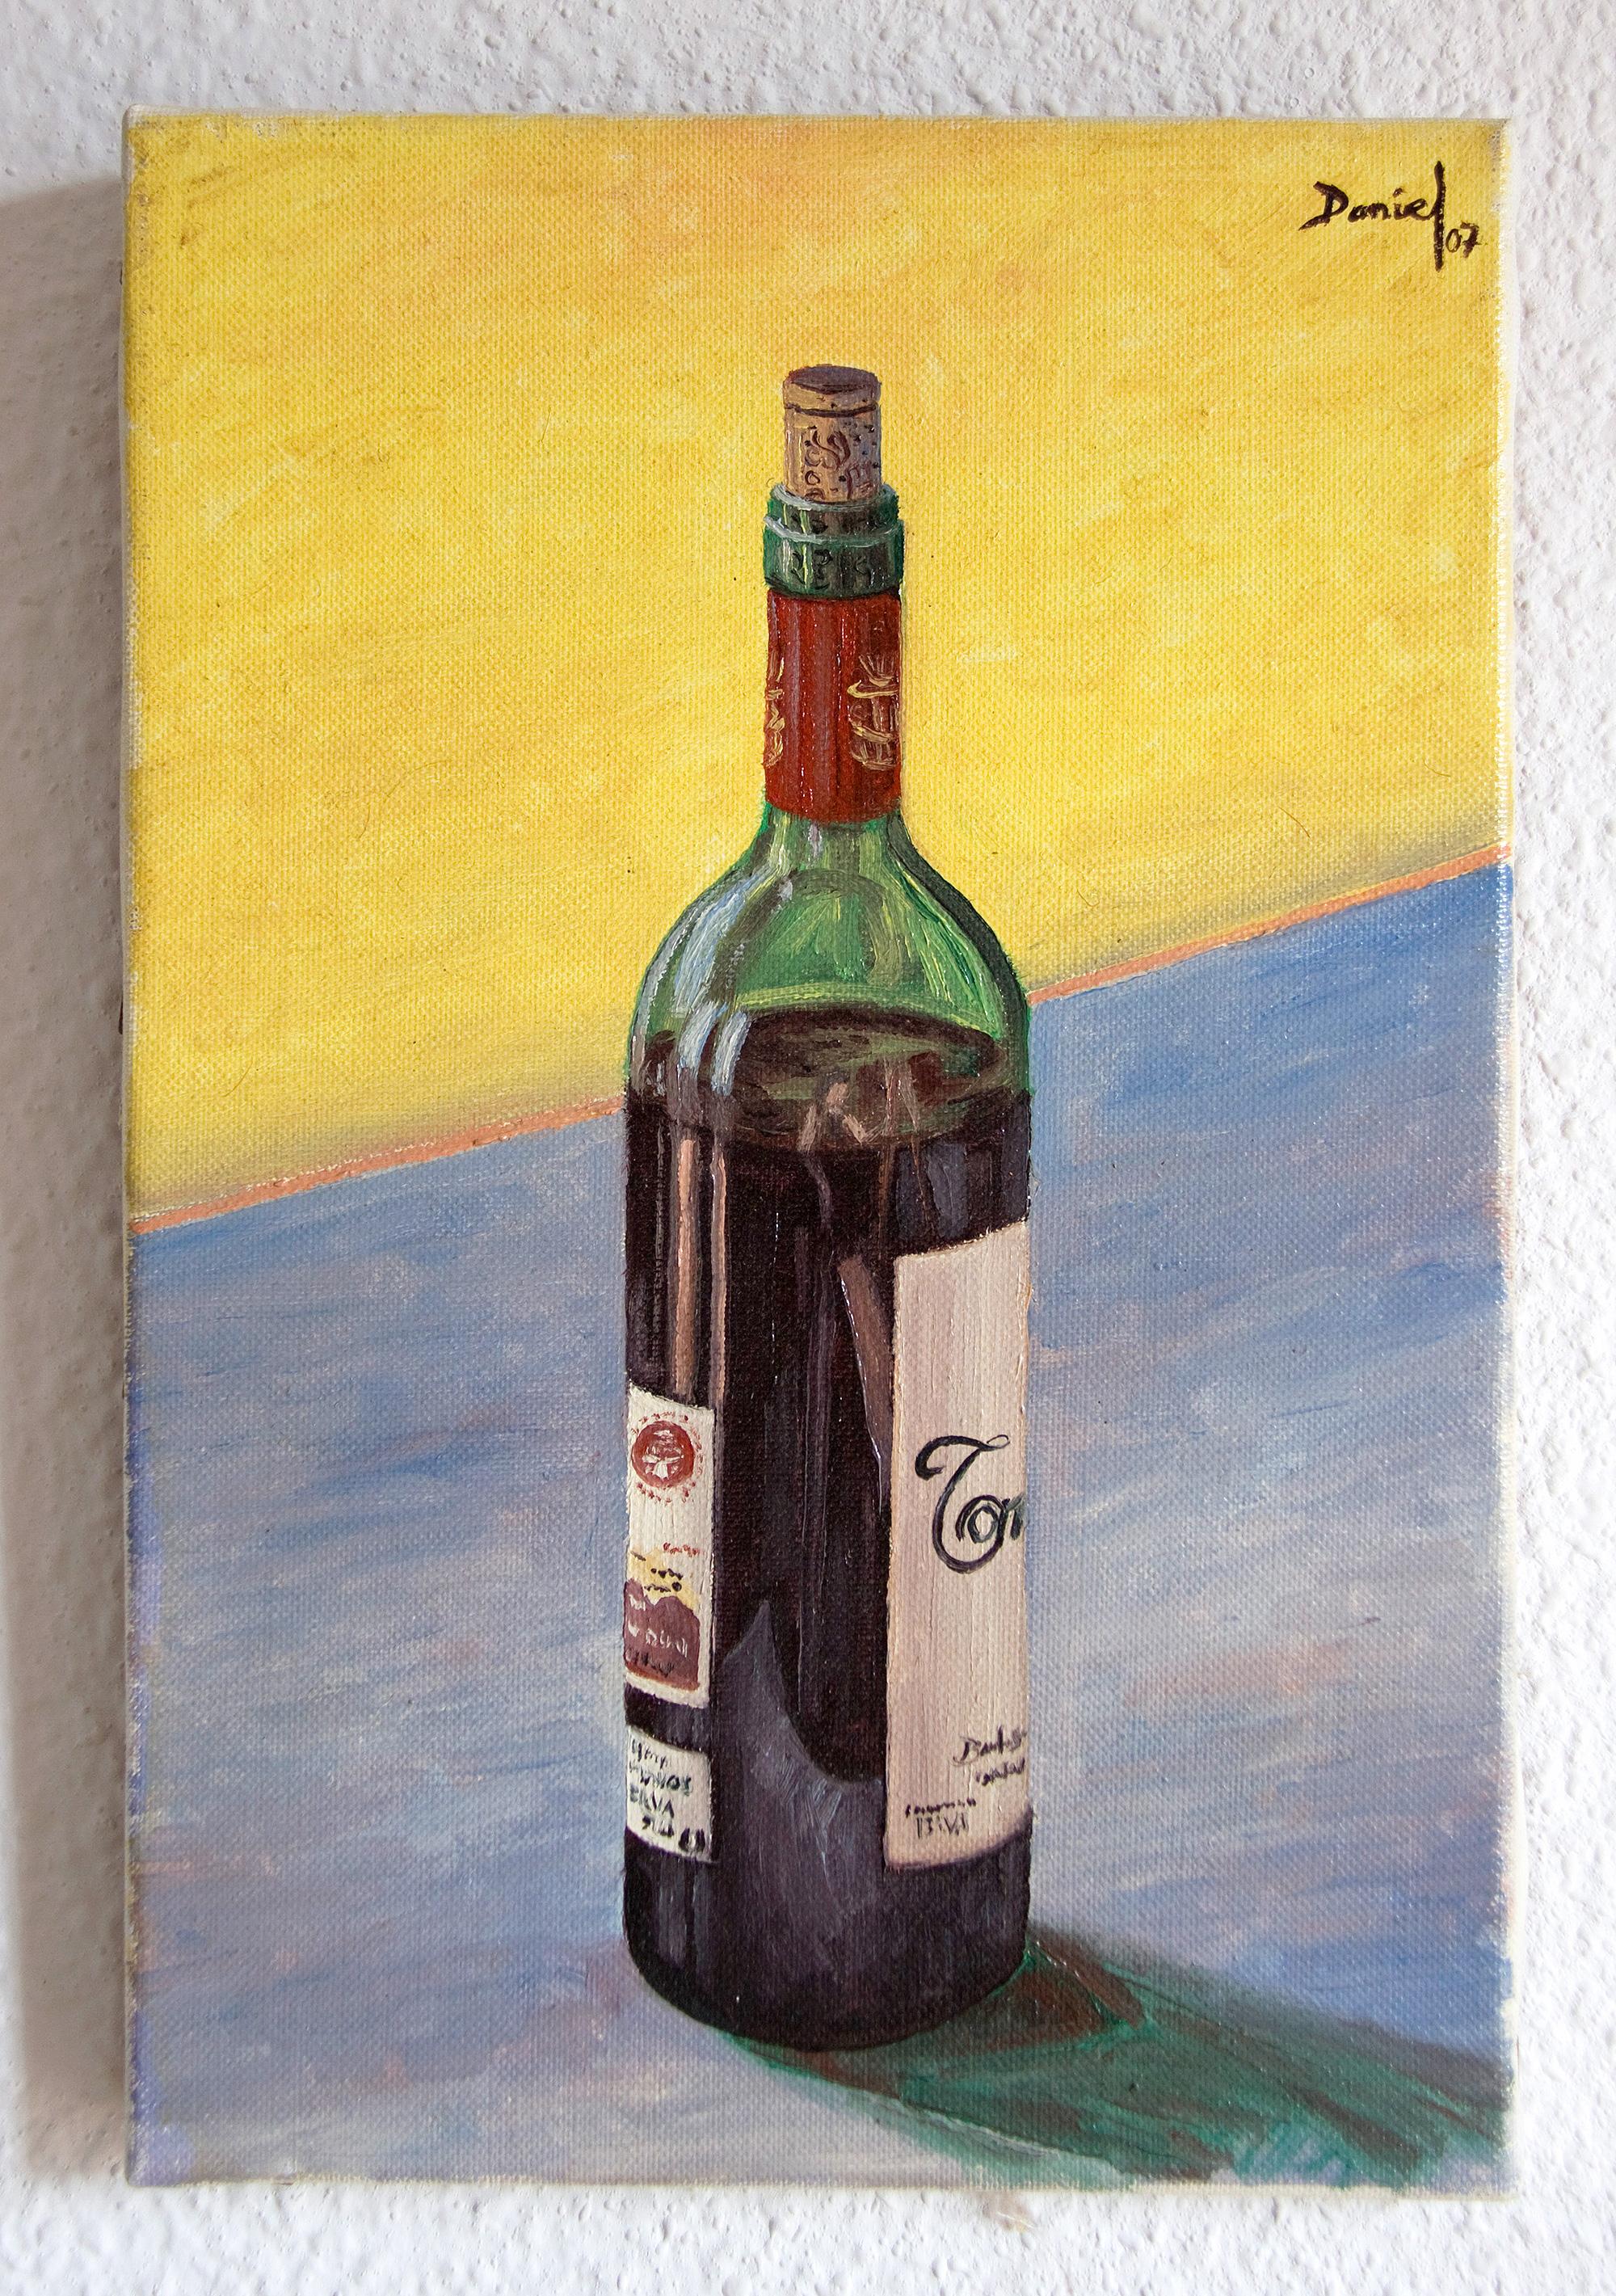 Botella de vino sobre fondo amarillo